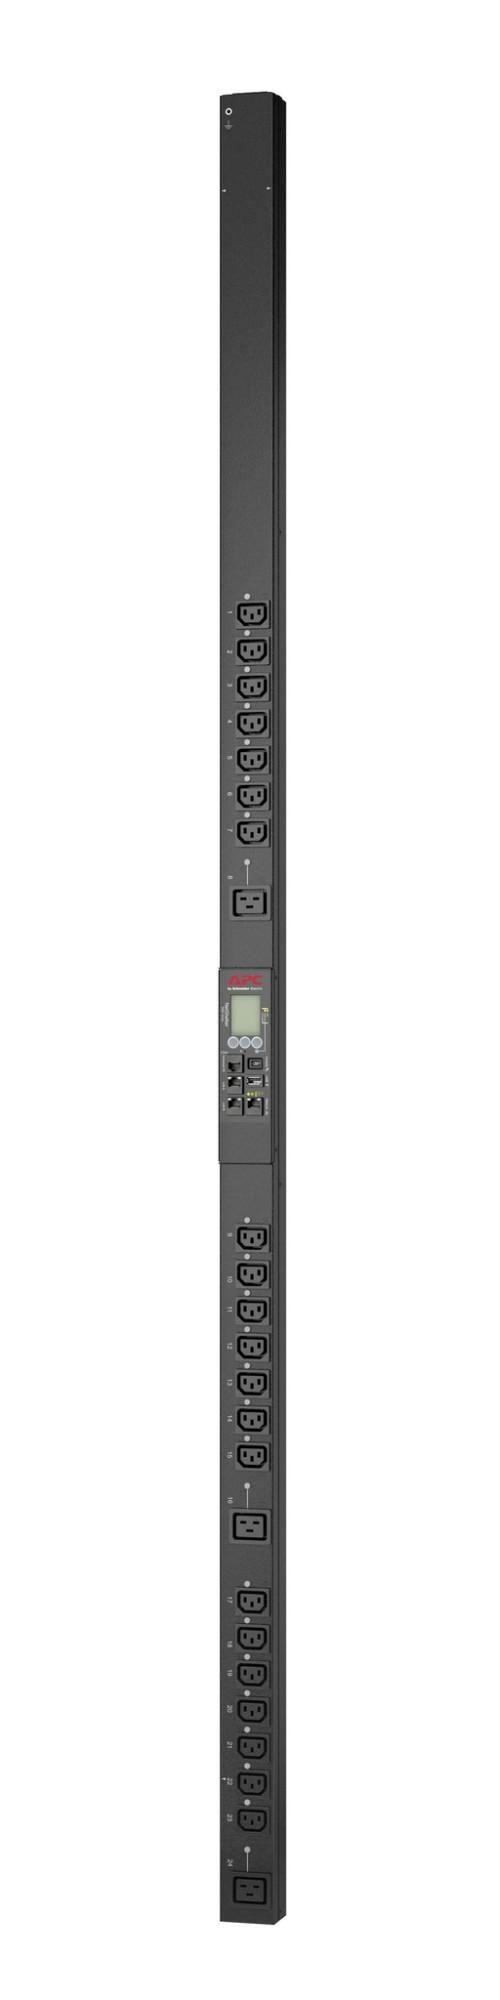 APC APDU9959EU3 power distribution unit (PDU) 24 AC outlet(s) 0U Black